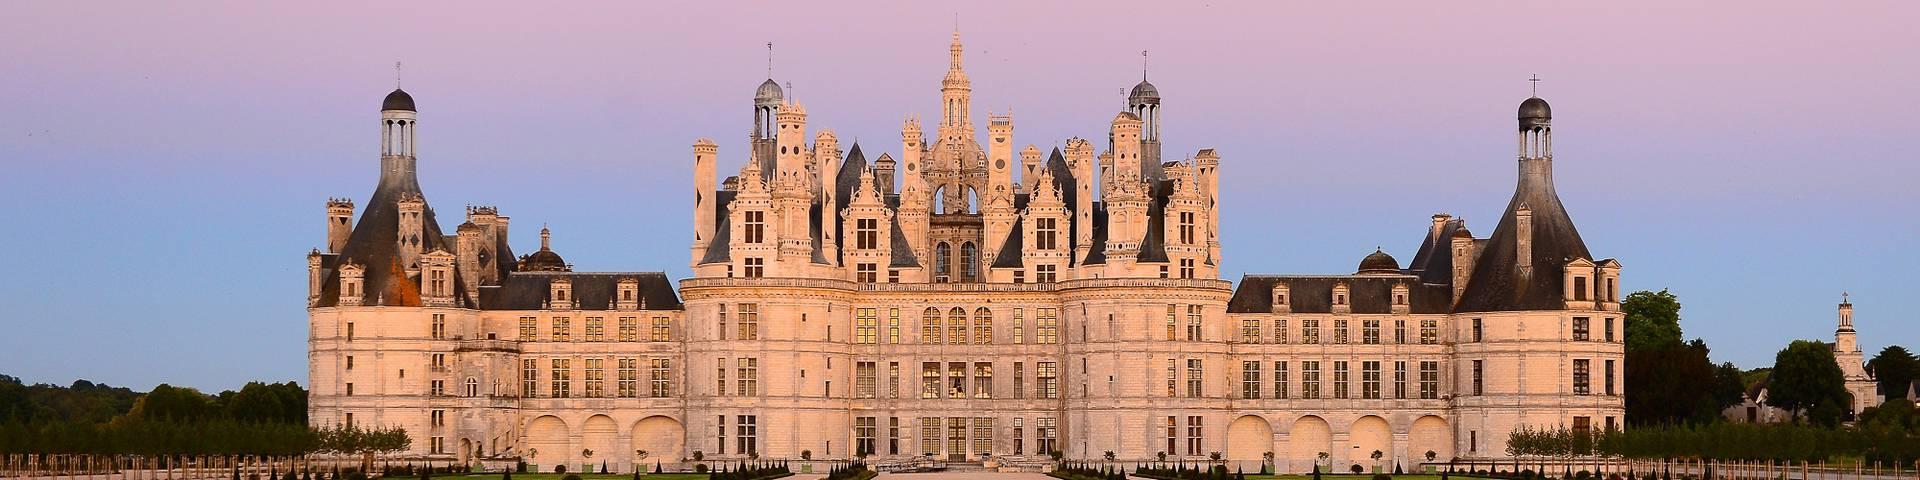 Castillo de Chambord. © Leonard de Serres